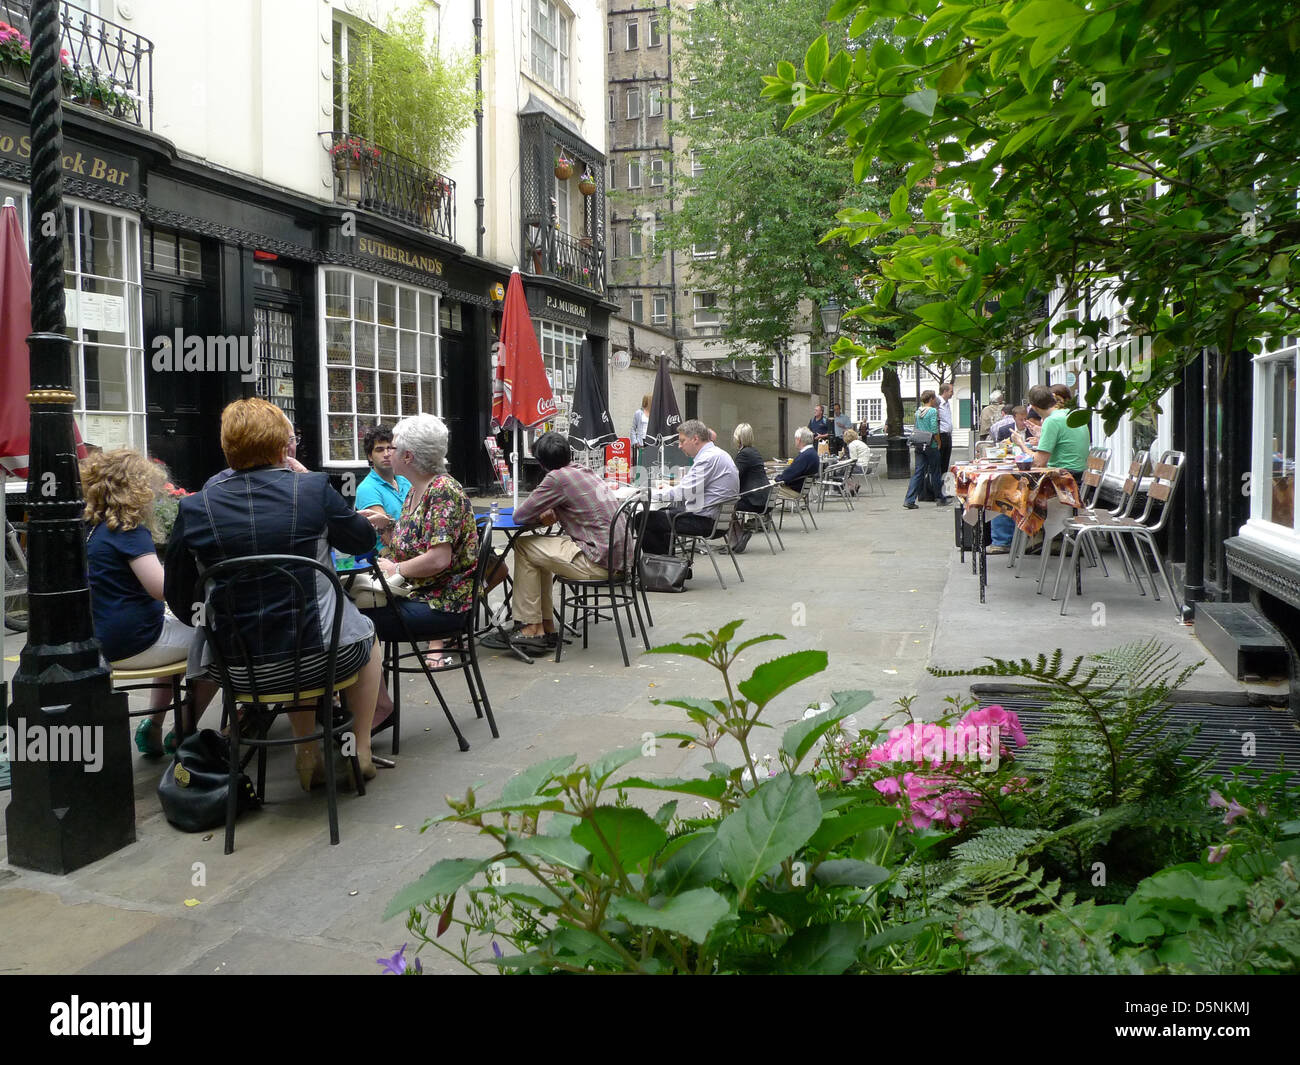 Woburn Walk in Bloomsbury, London, UK. - Stock Image